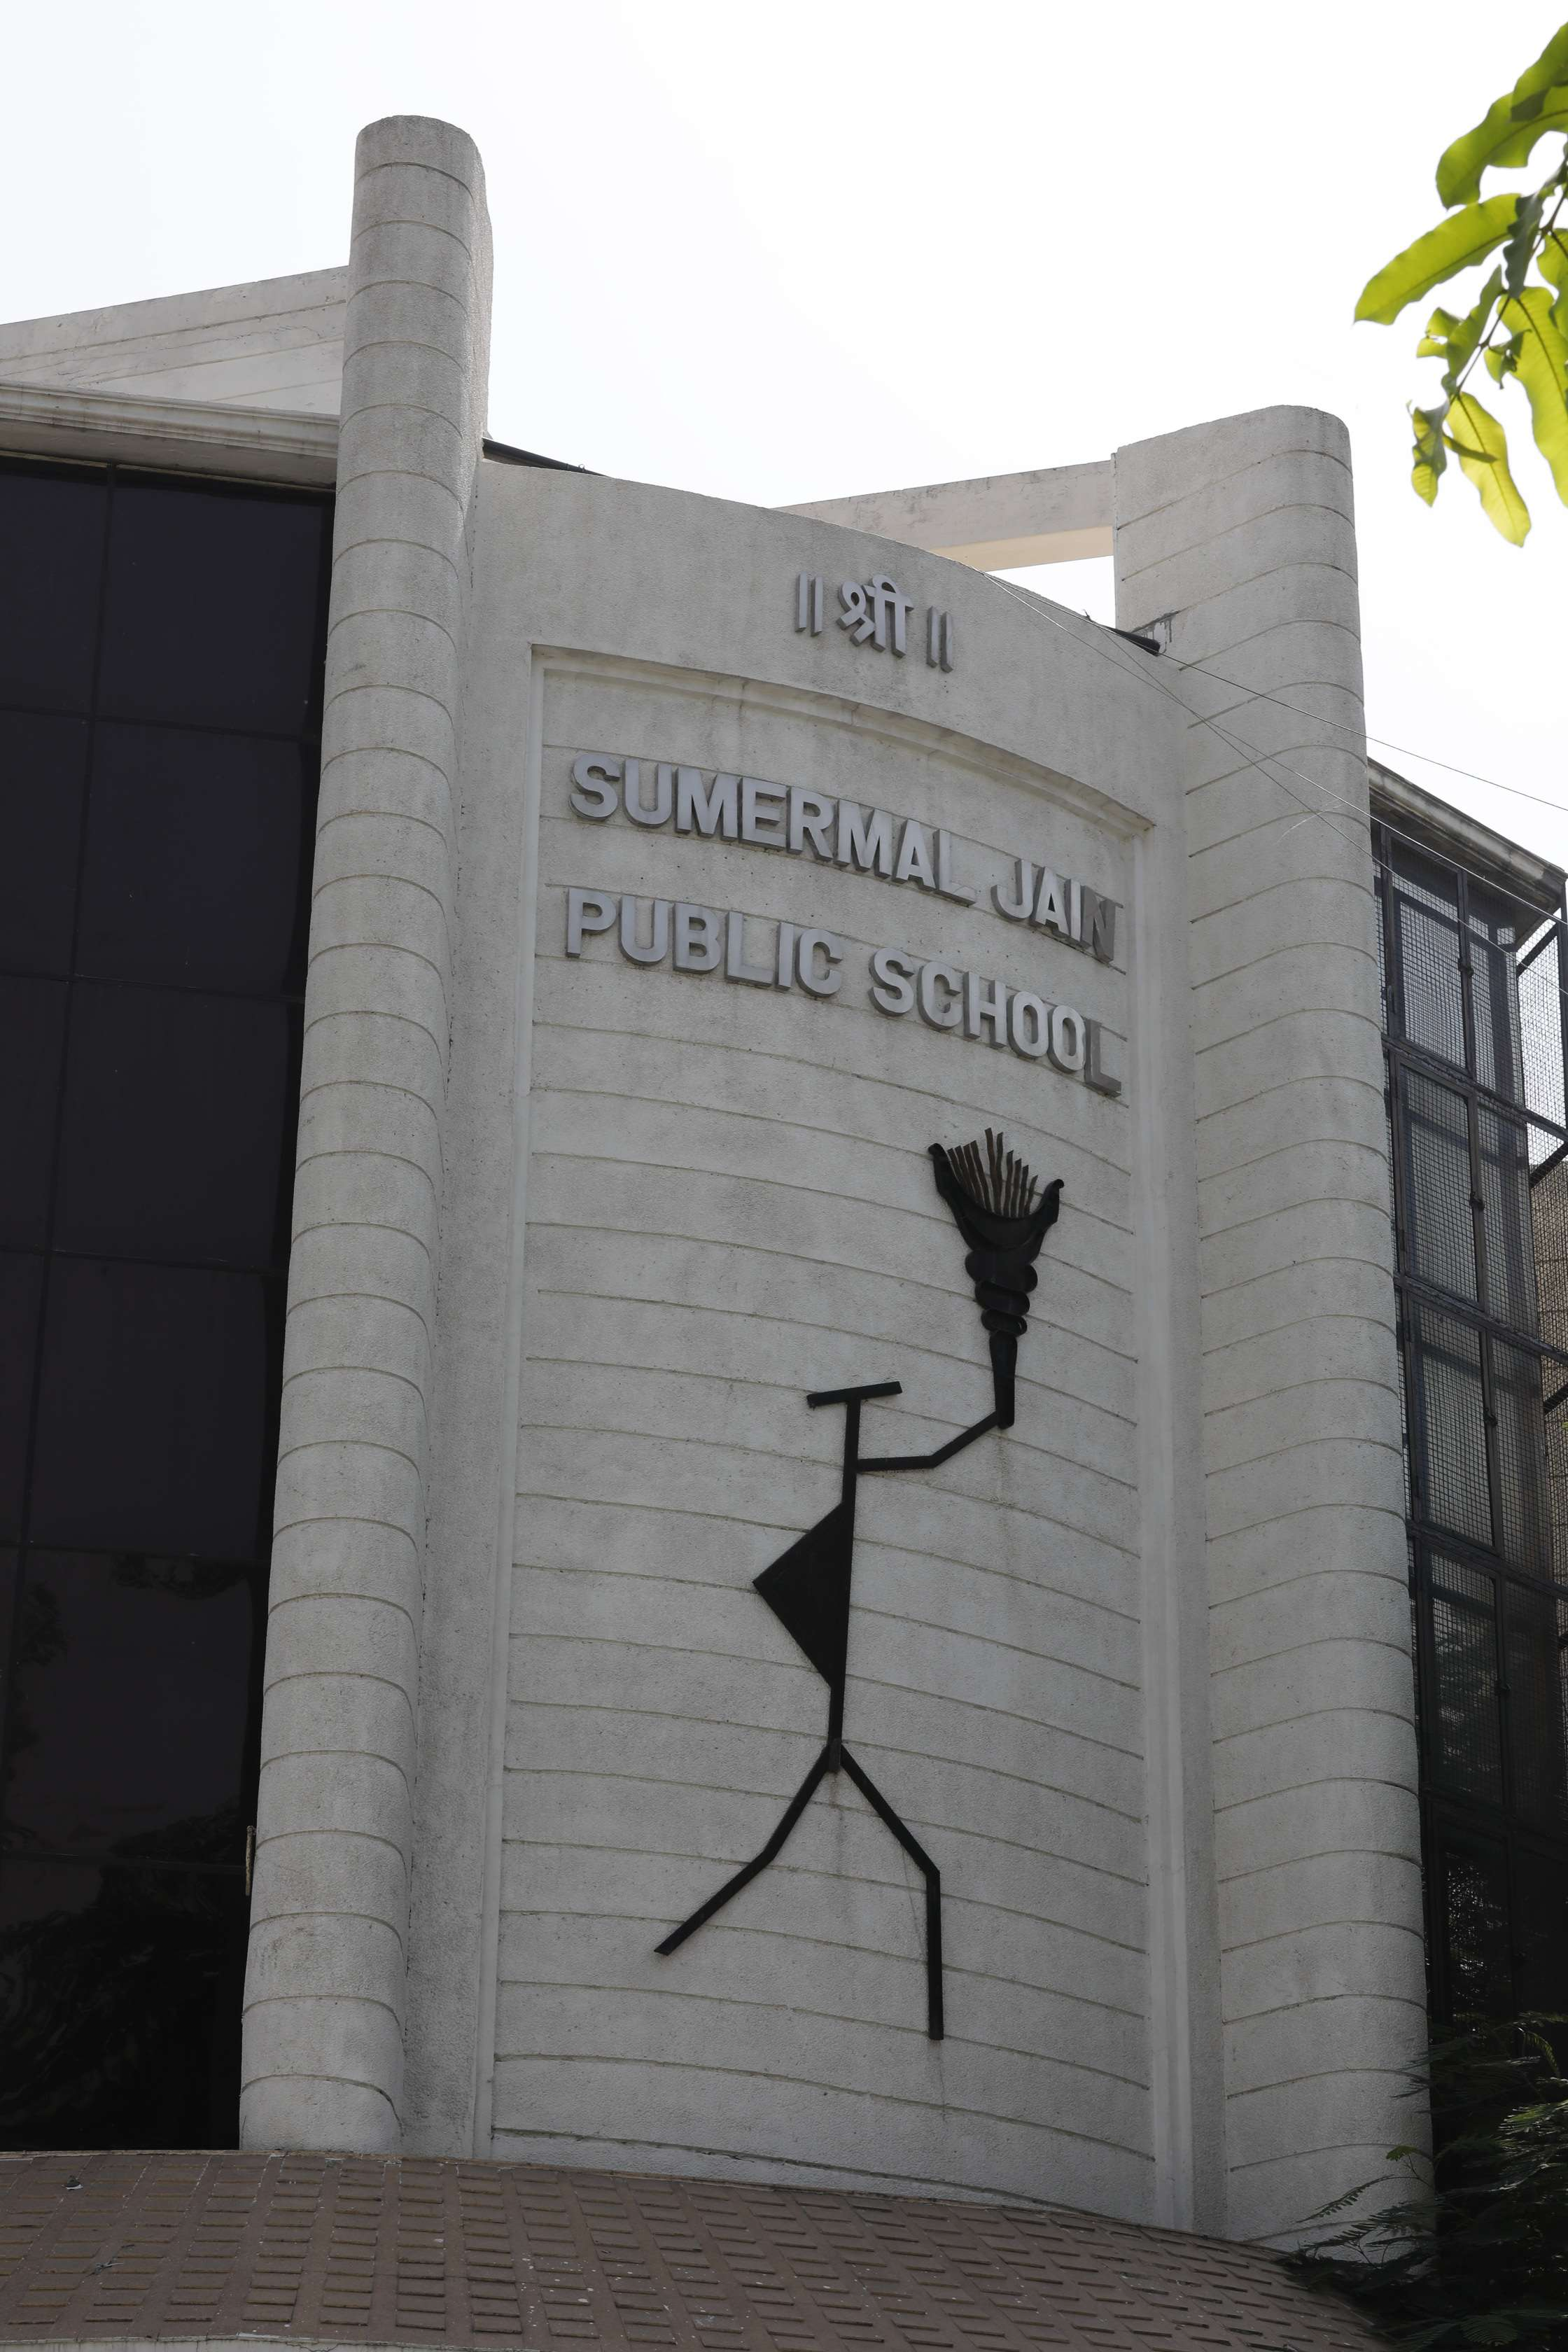 SUMER MAL JAIN PUBLIC SCHOOL B 2 BLOCK JANAK PURI NEW DELHI 2730158